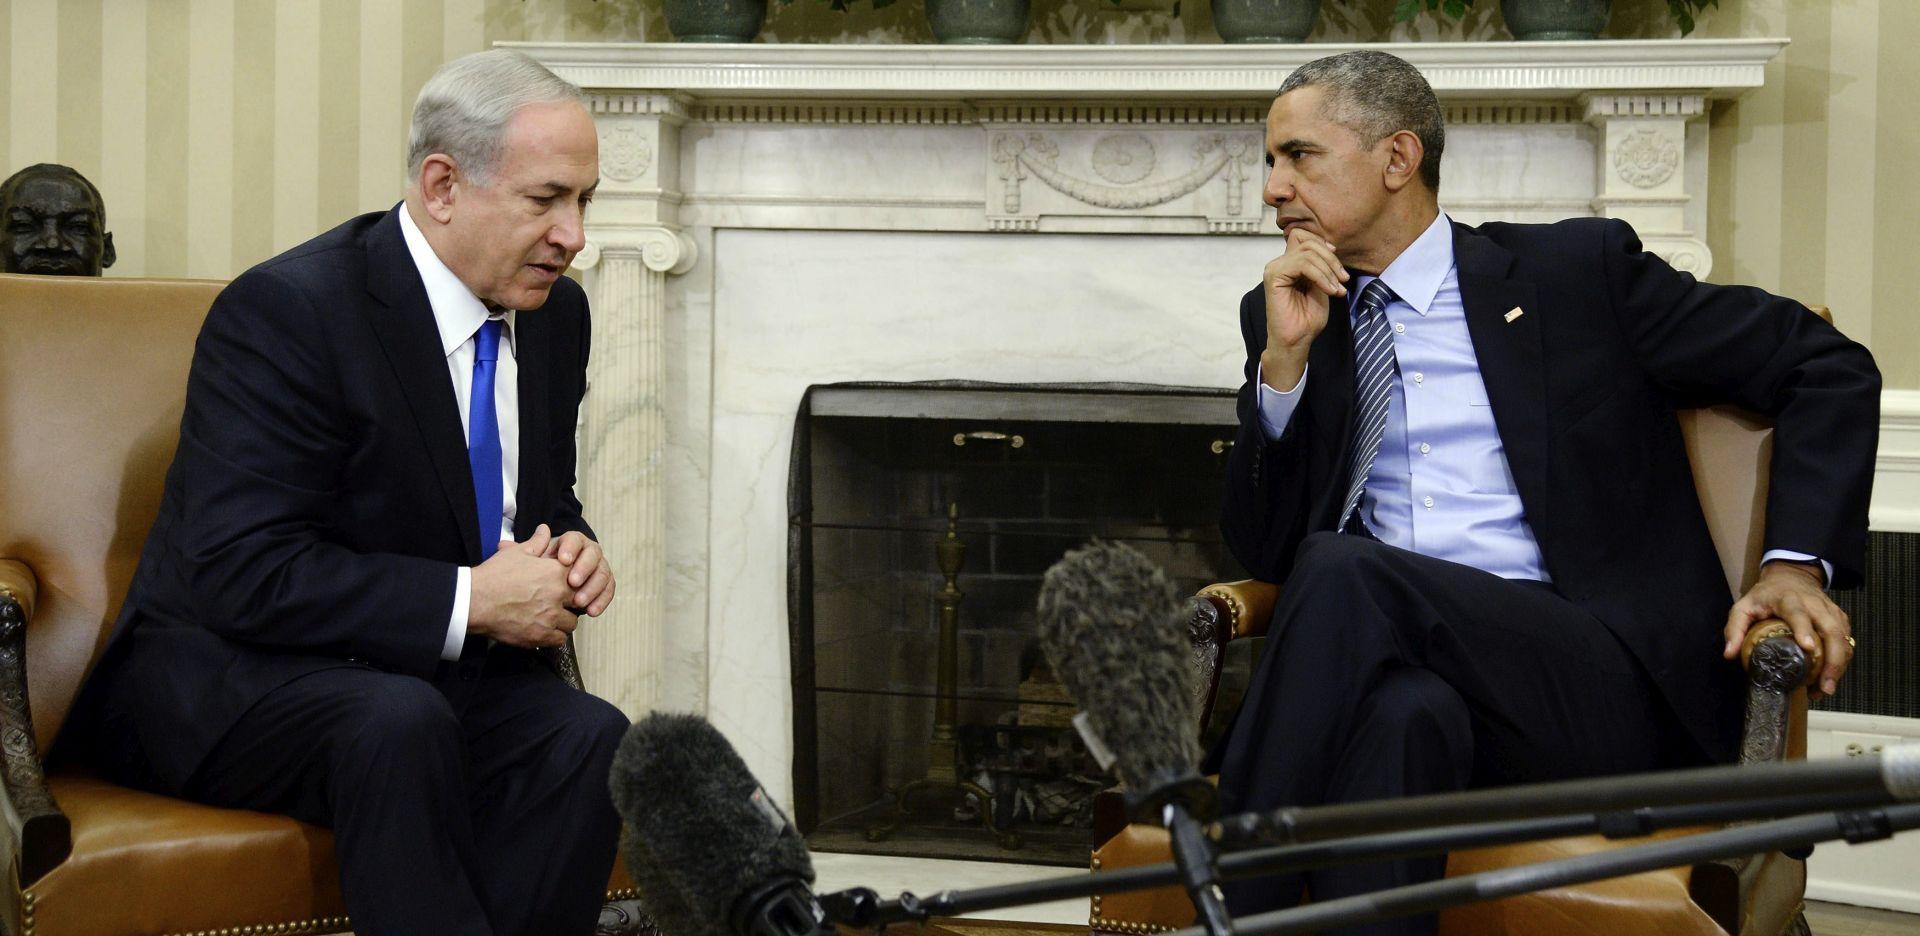 Obama primio Netanyahua, naglasio čvrste veze s Izraelom